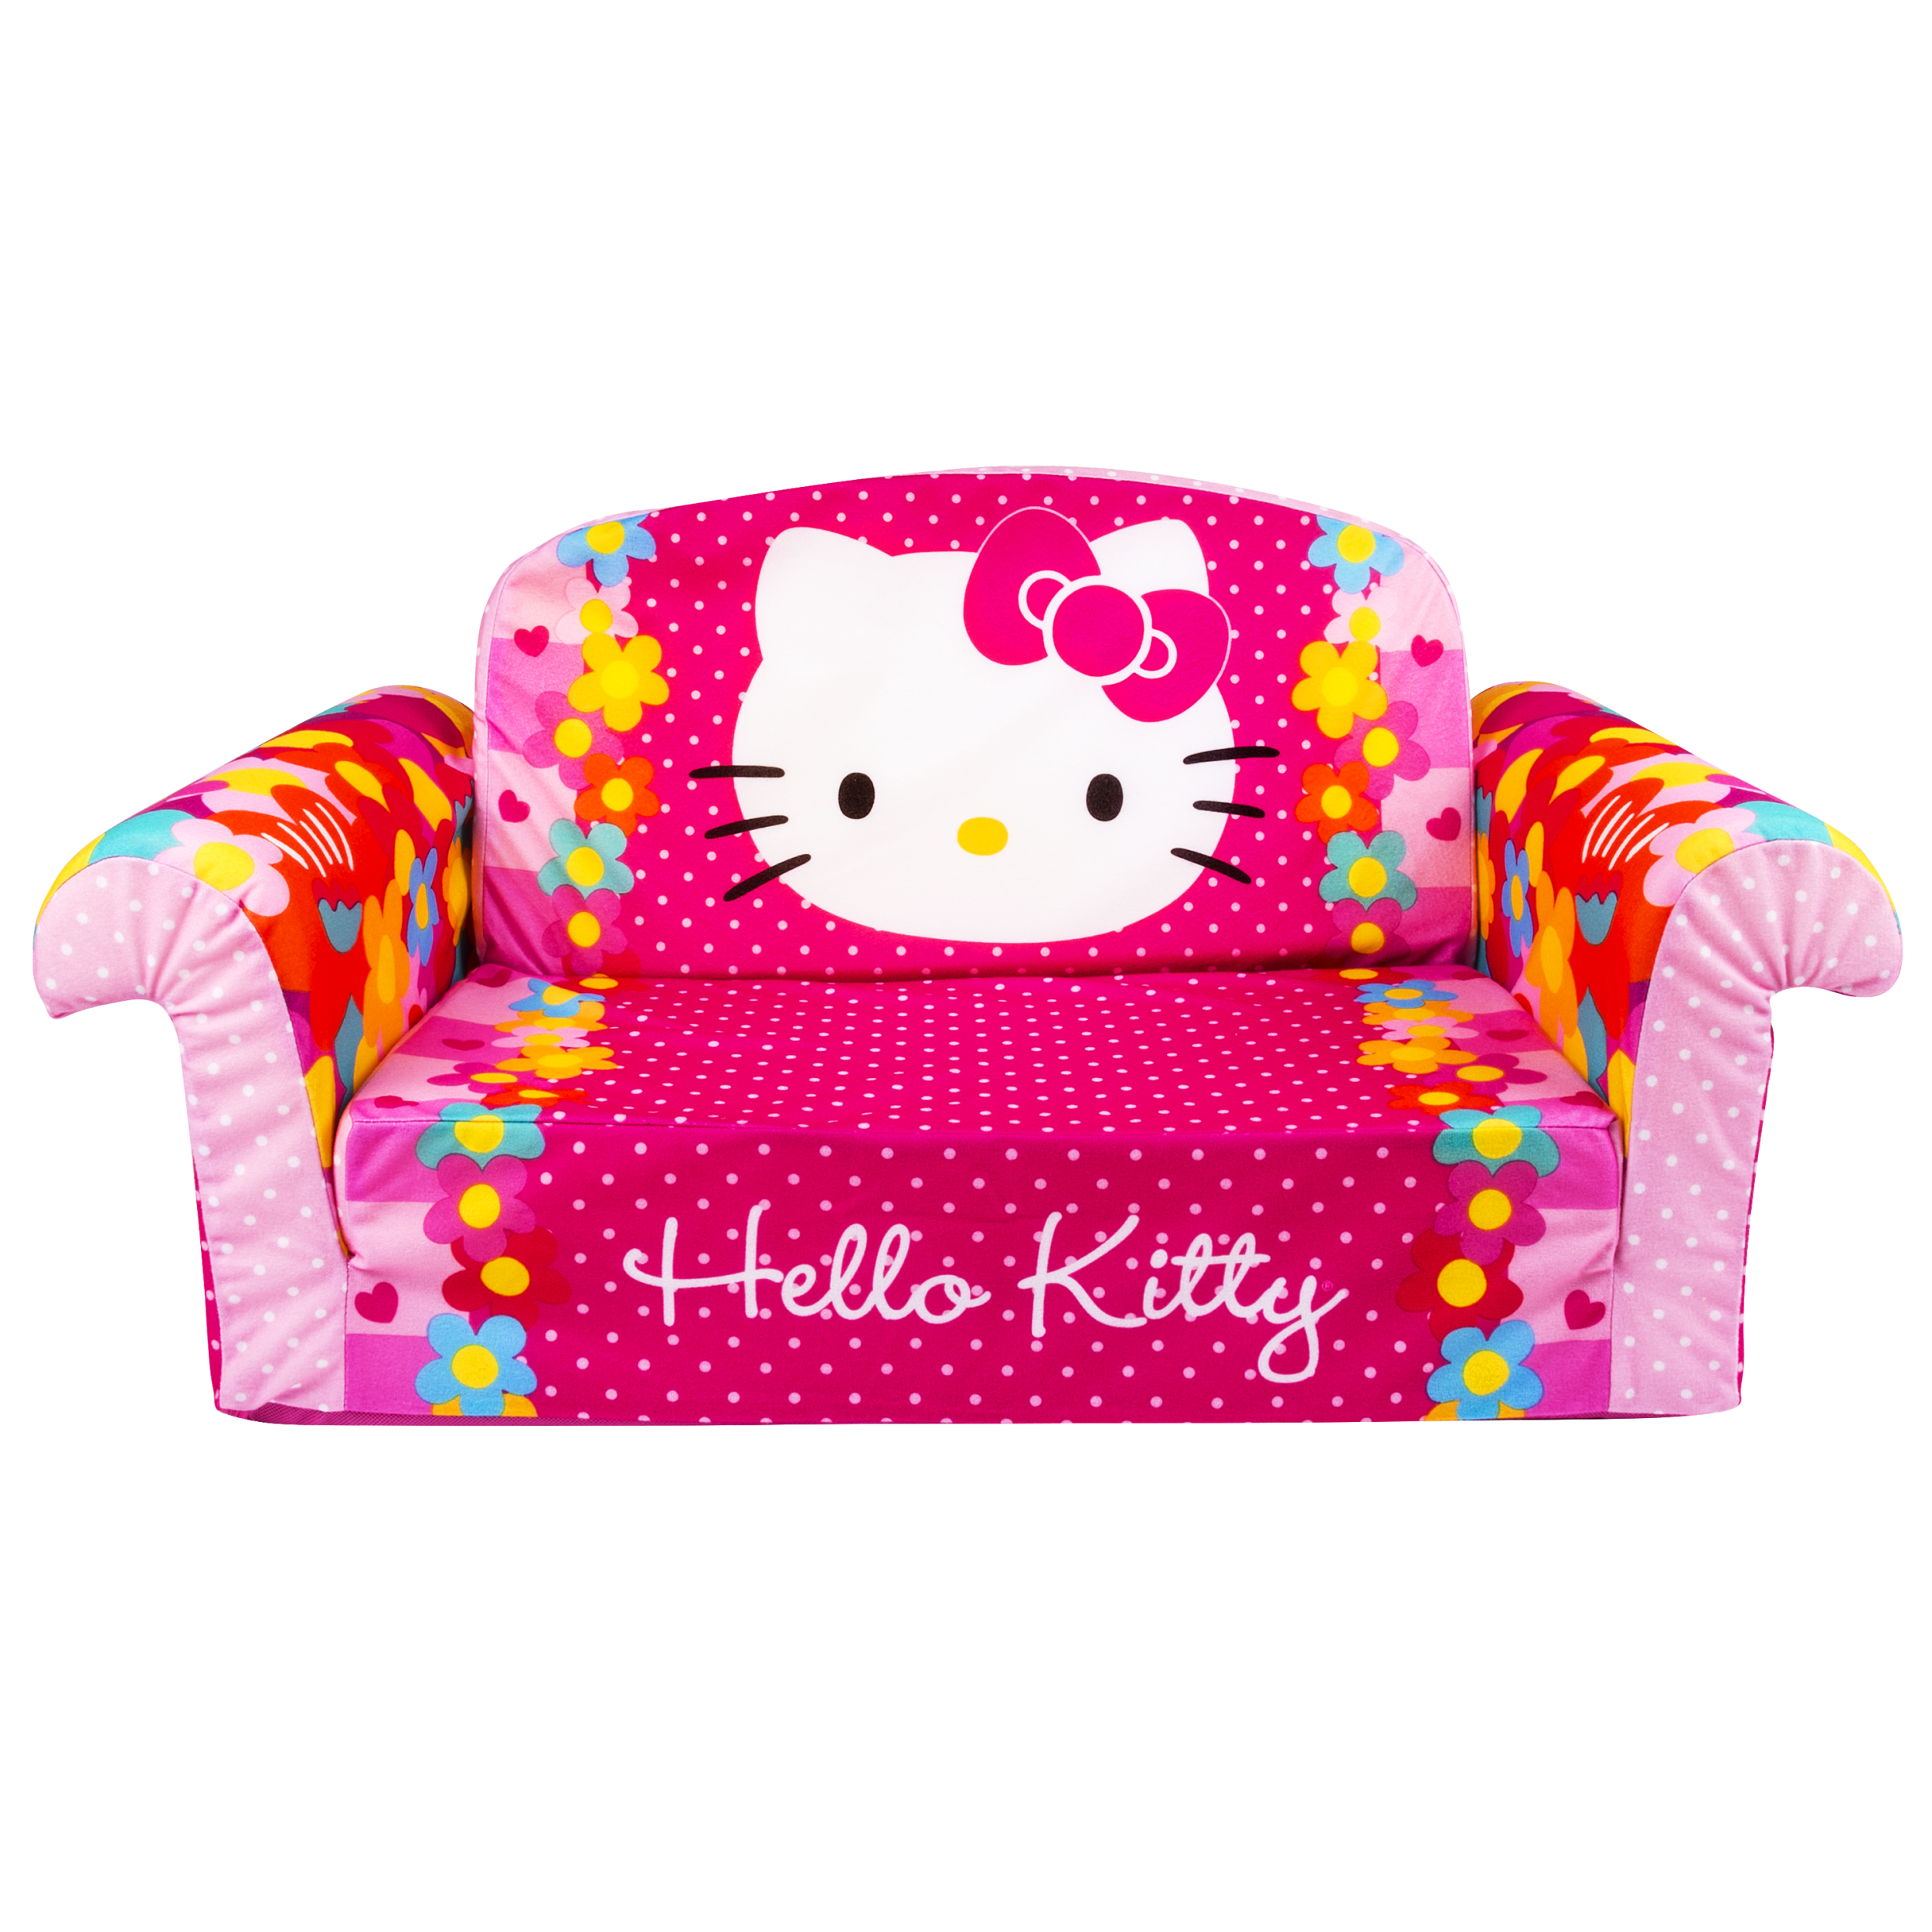 Hello Kitty, Toddler 2 in 1 Furniture Flip Open Sofa Chair